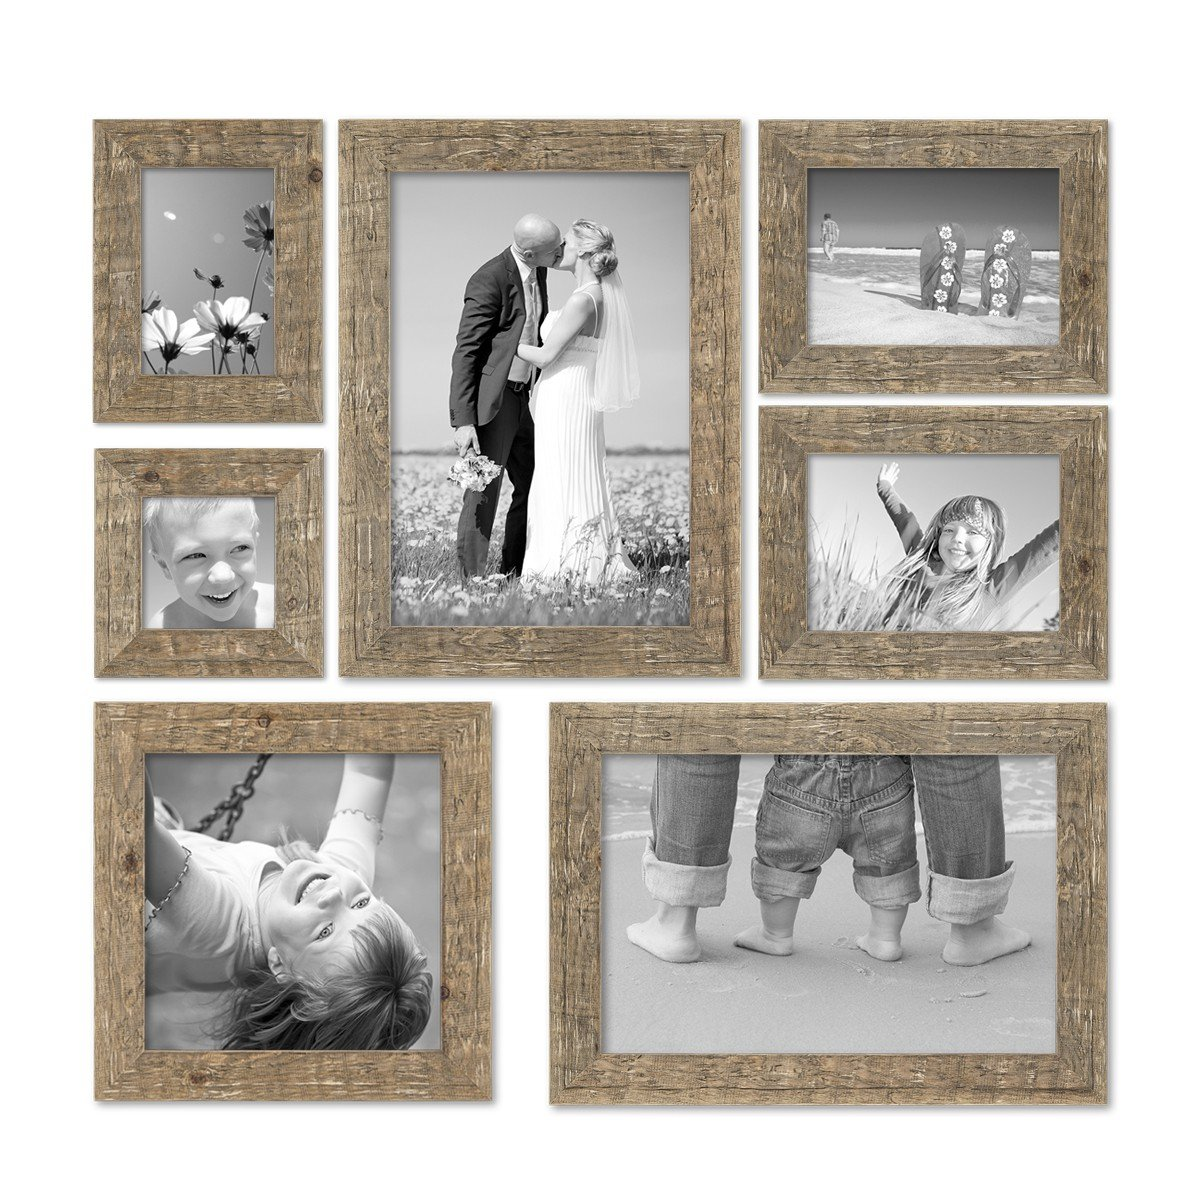 PHOTOLINI 7er Bilderrahmen-Set 10x10 10x15 13x18 20x20 und 20x30 cm ...